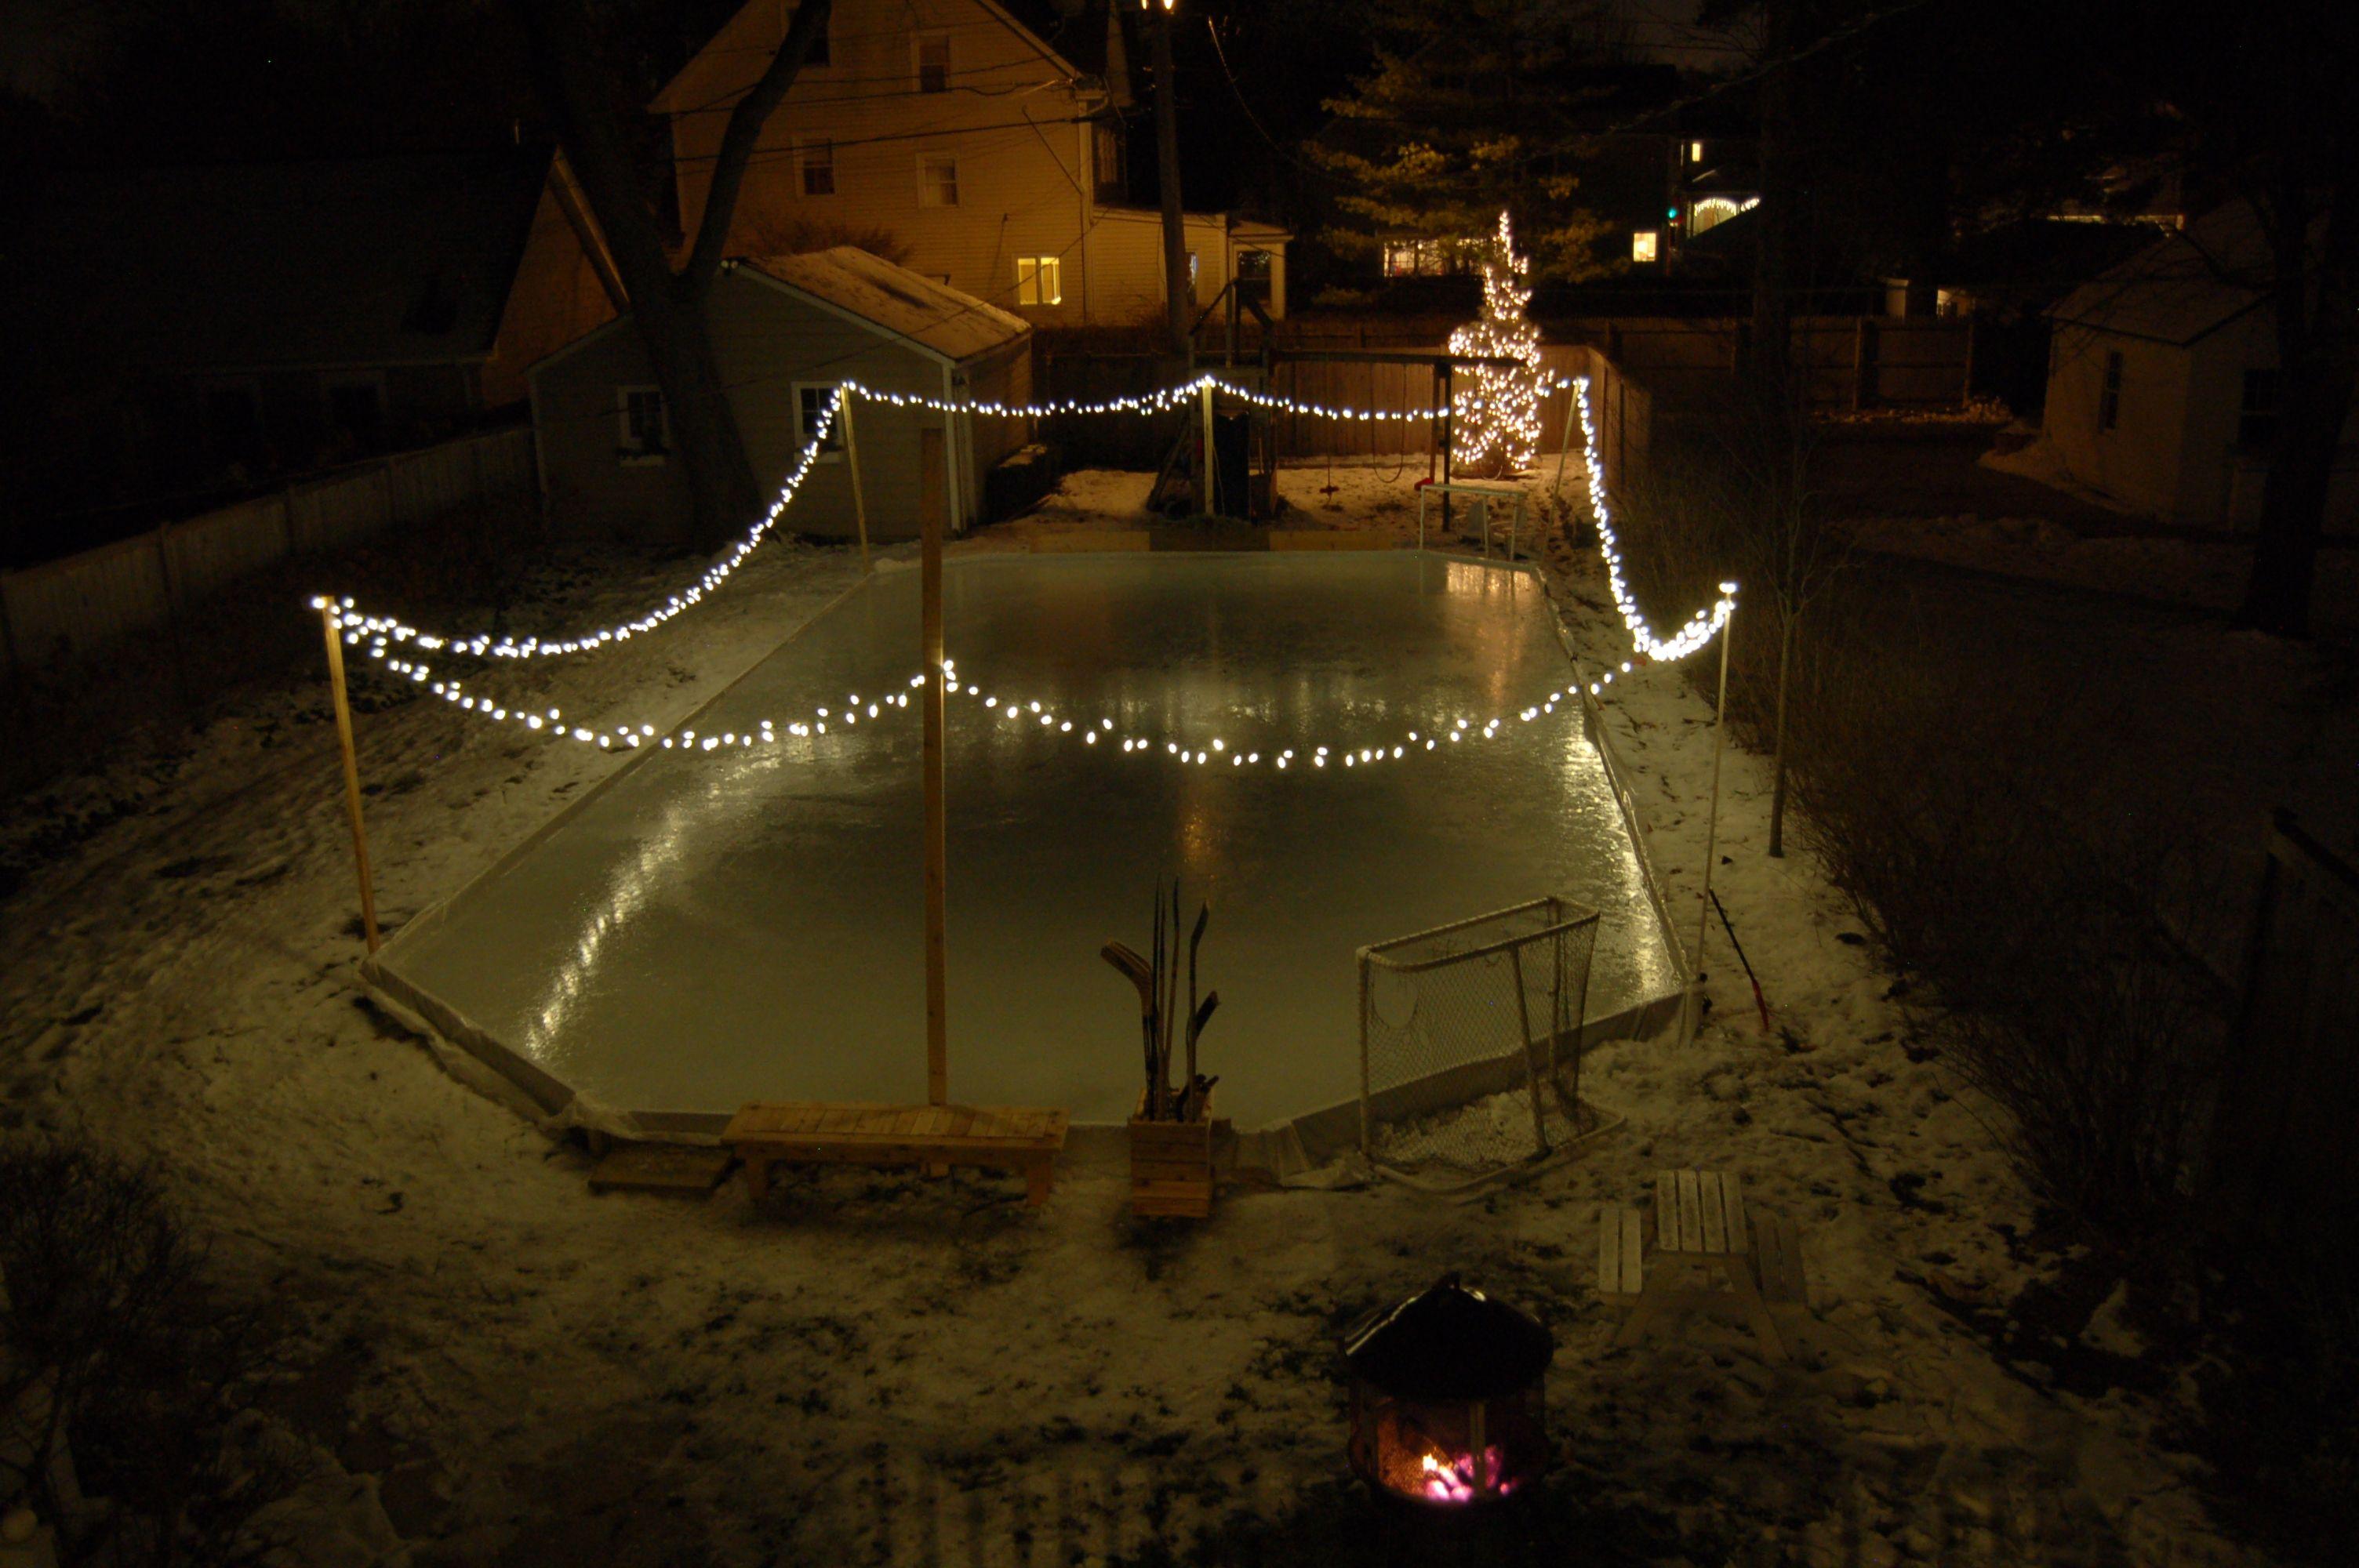 2013 backyard ice rink backyard ice rink pinterest backyard